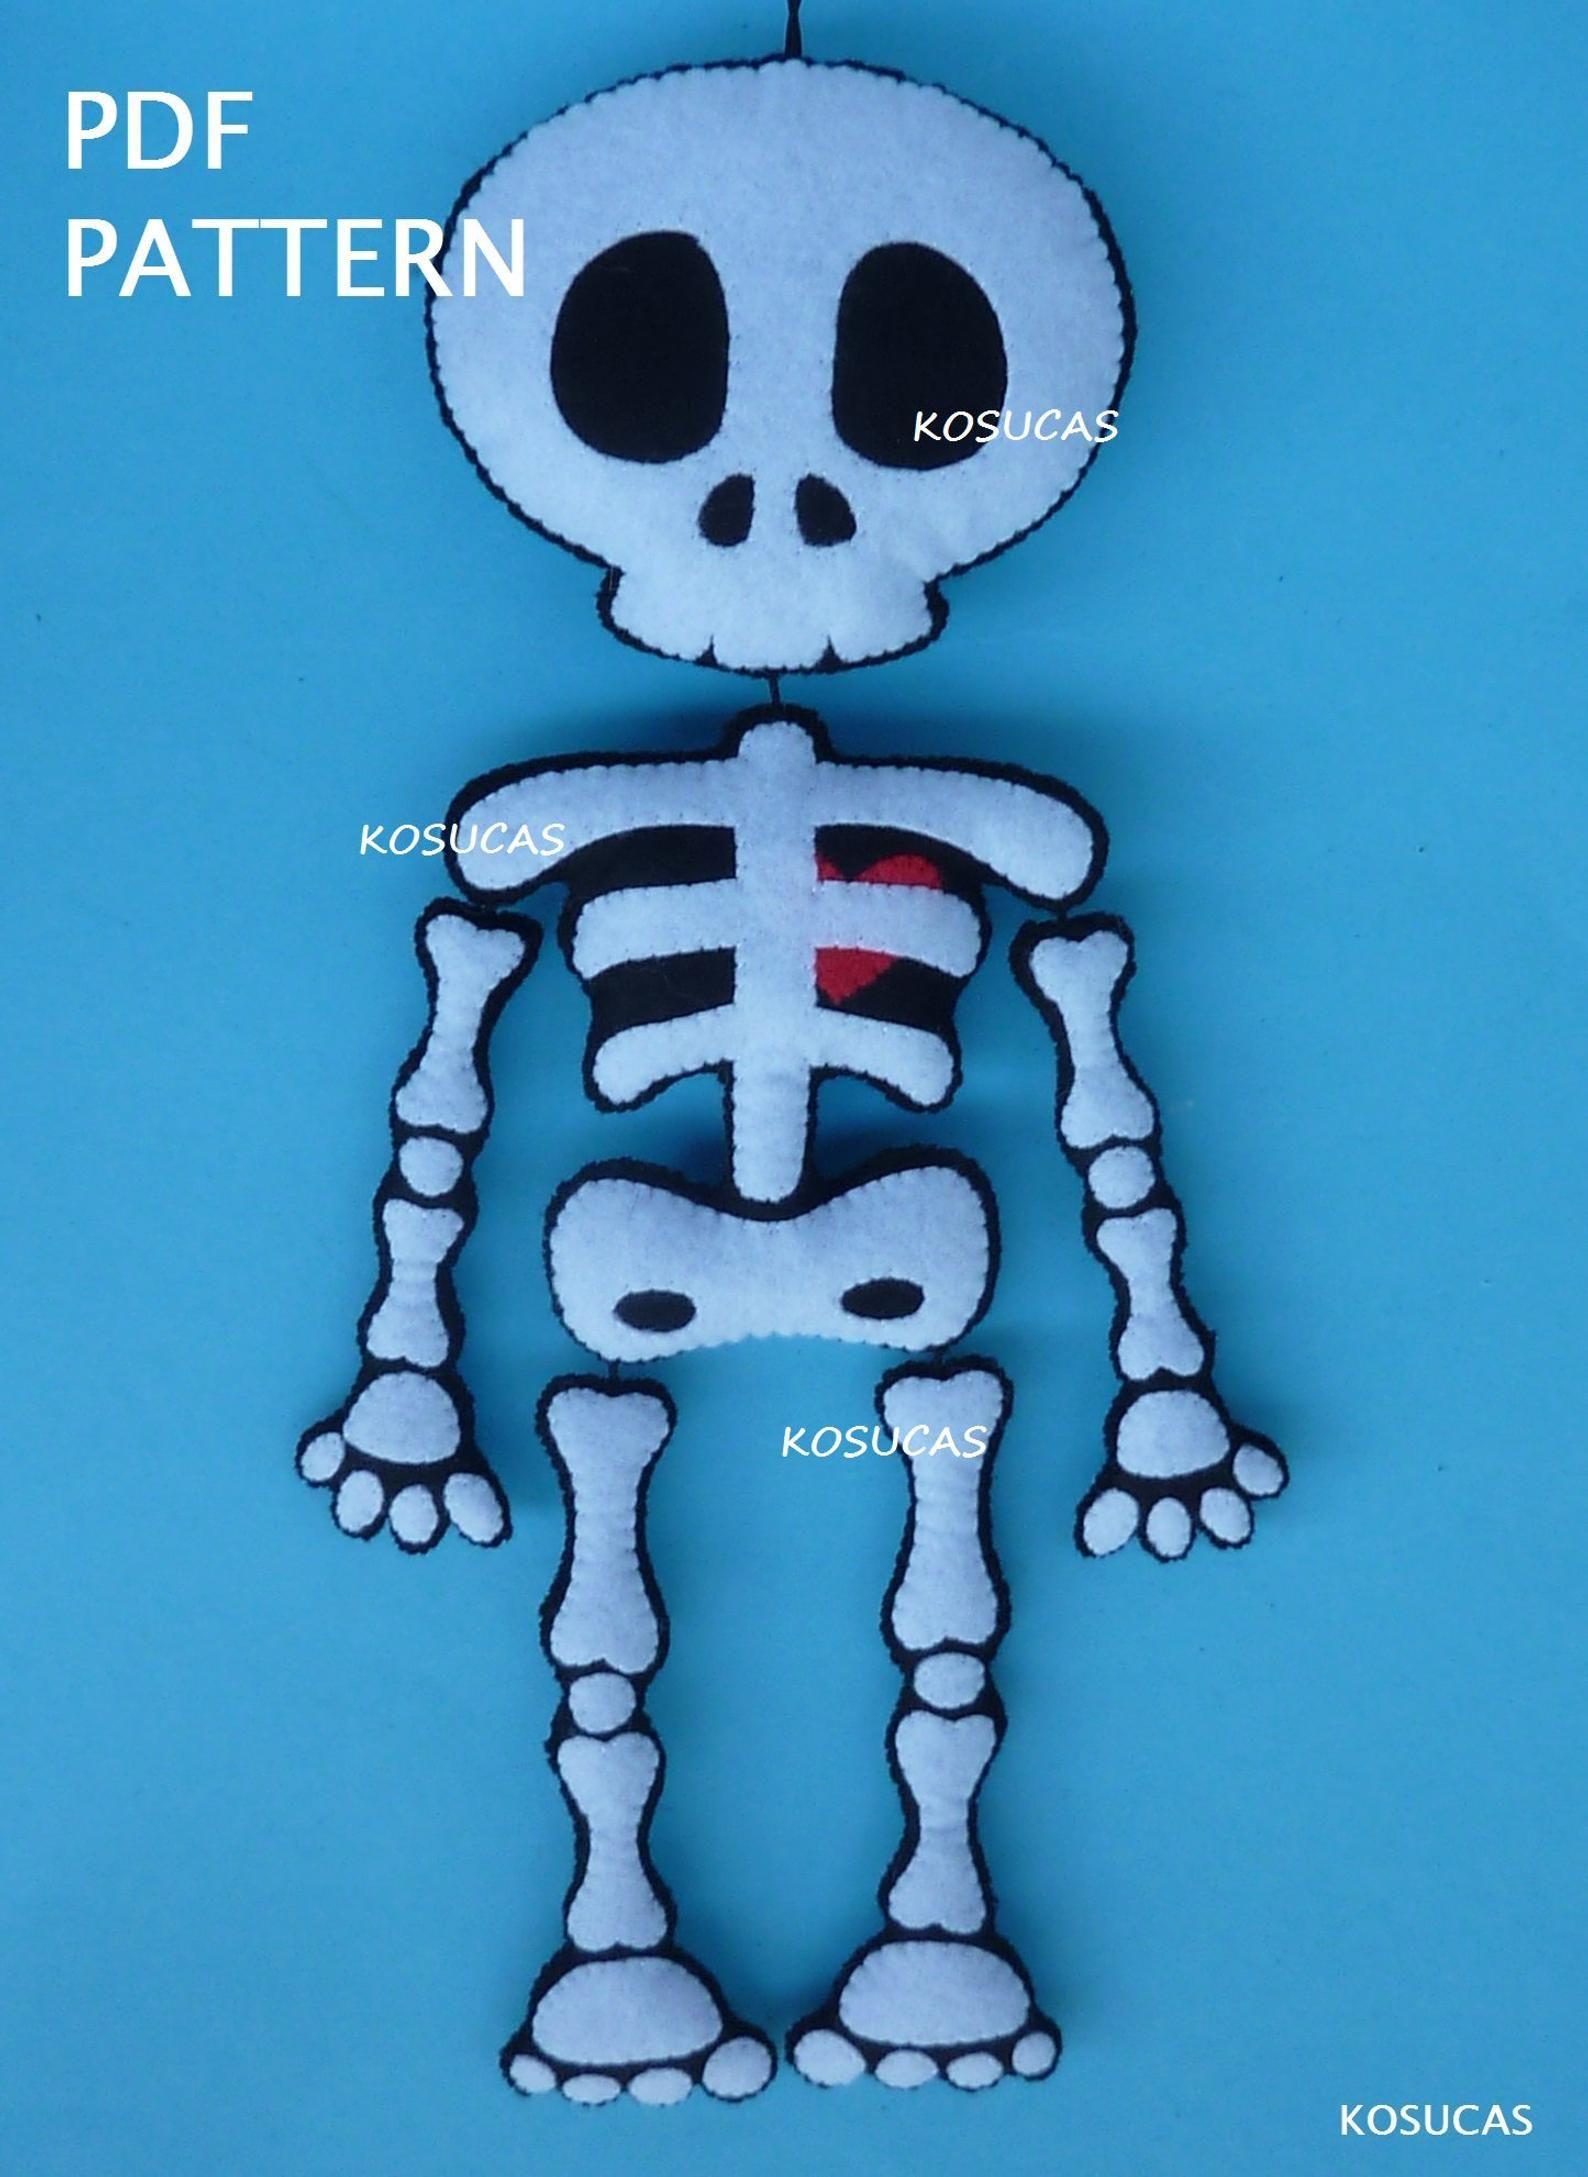 Pdf Tutorial To Make A Felt Skeleton Etsy In 2021 Halloween Felt Crafts Felt Halloween Halloween Patterns